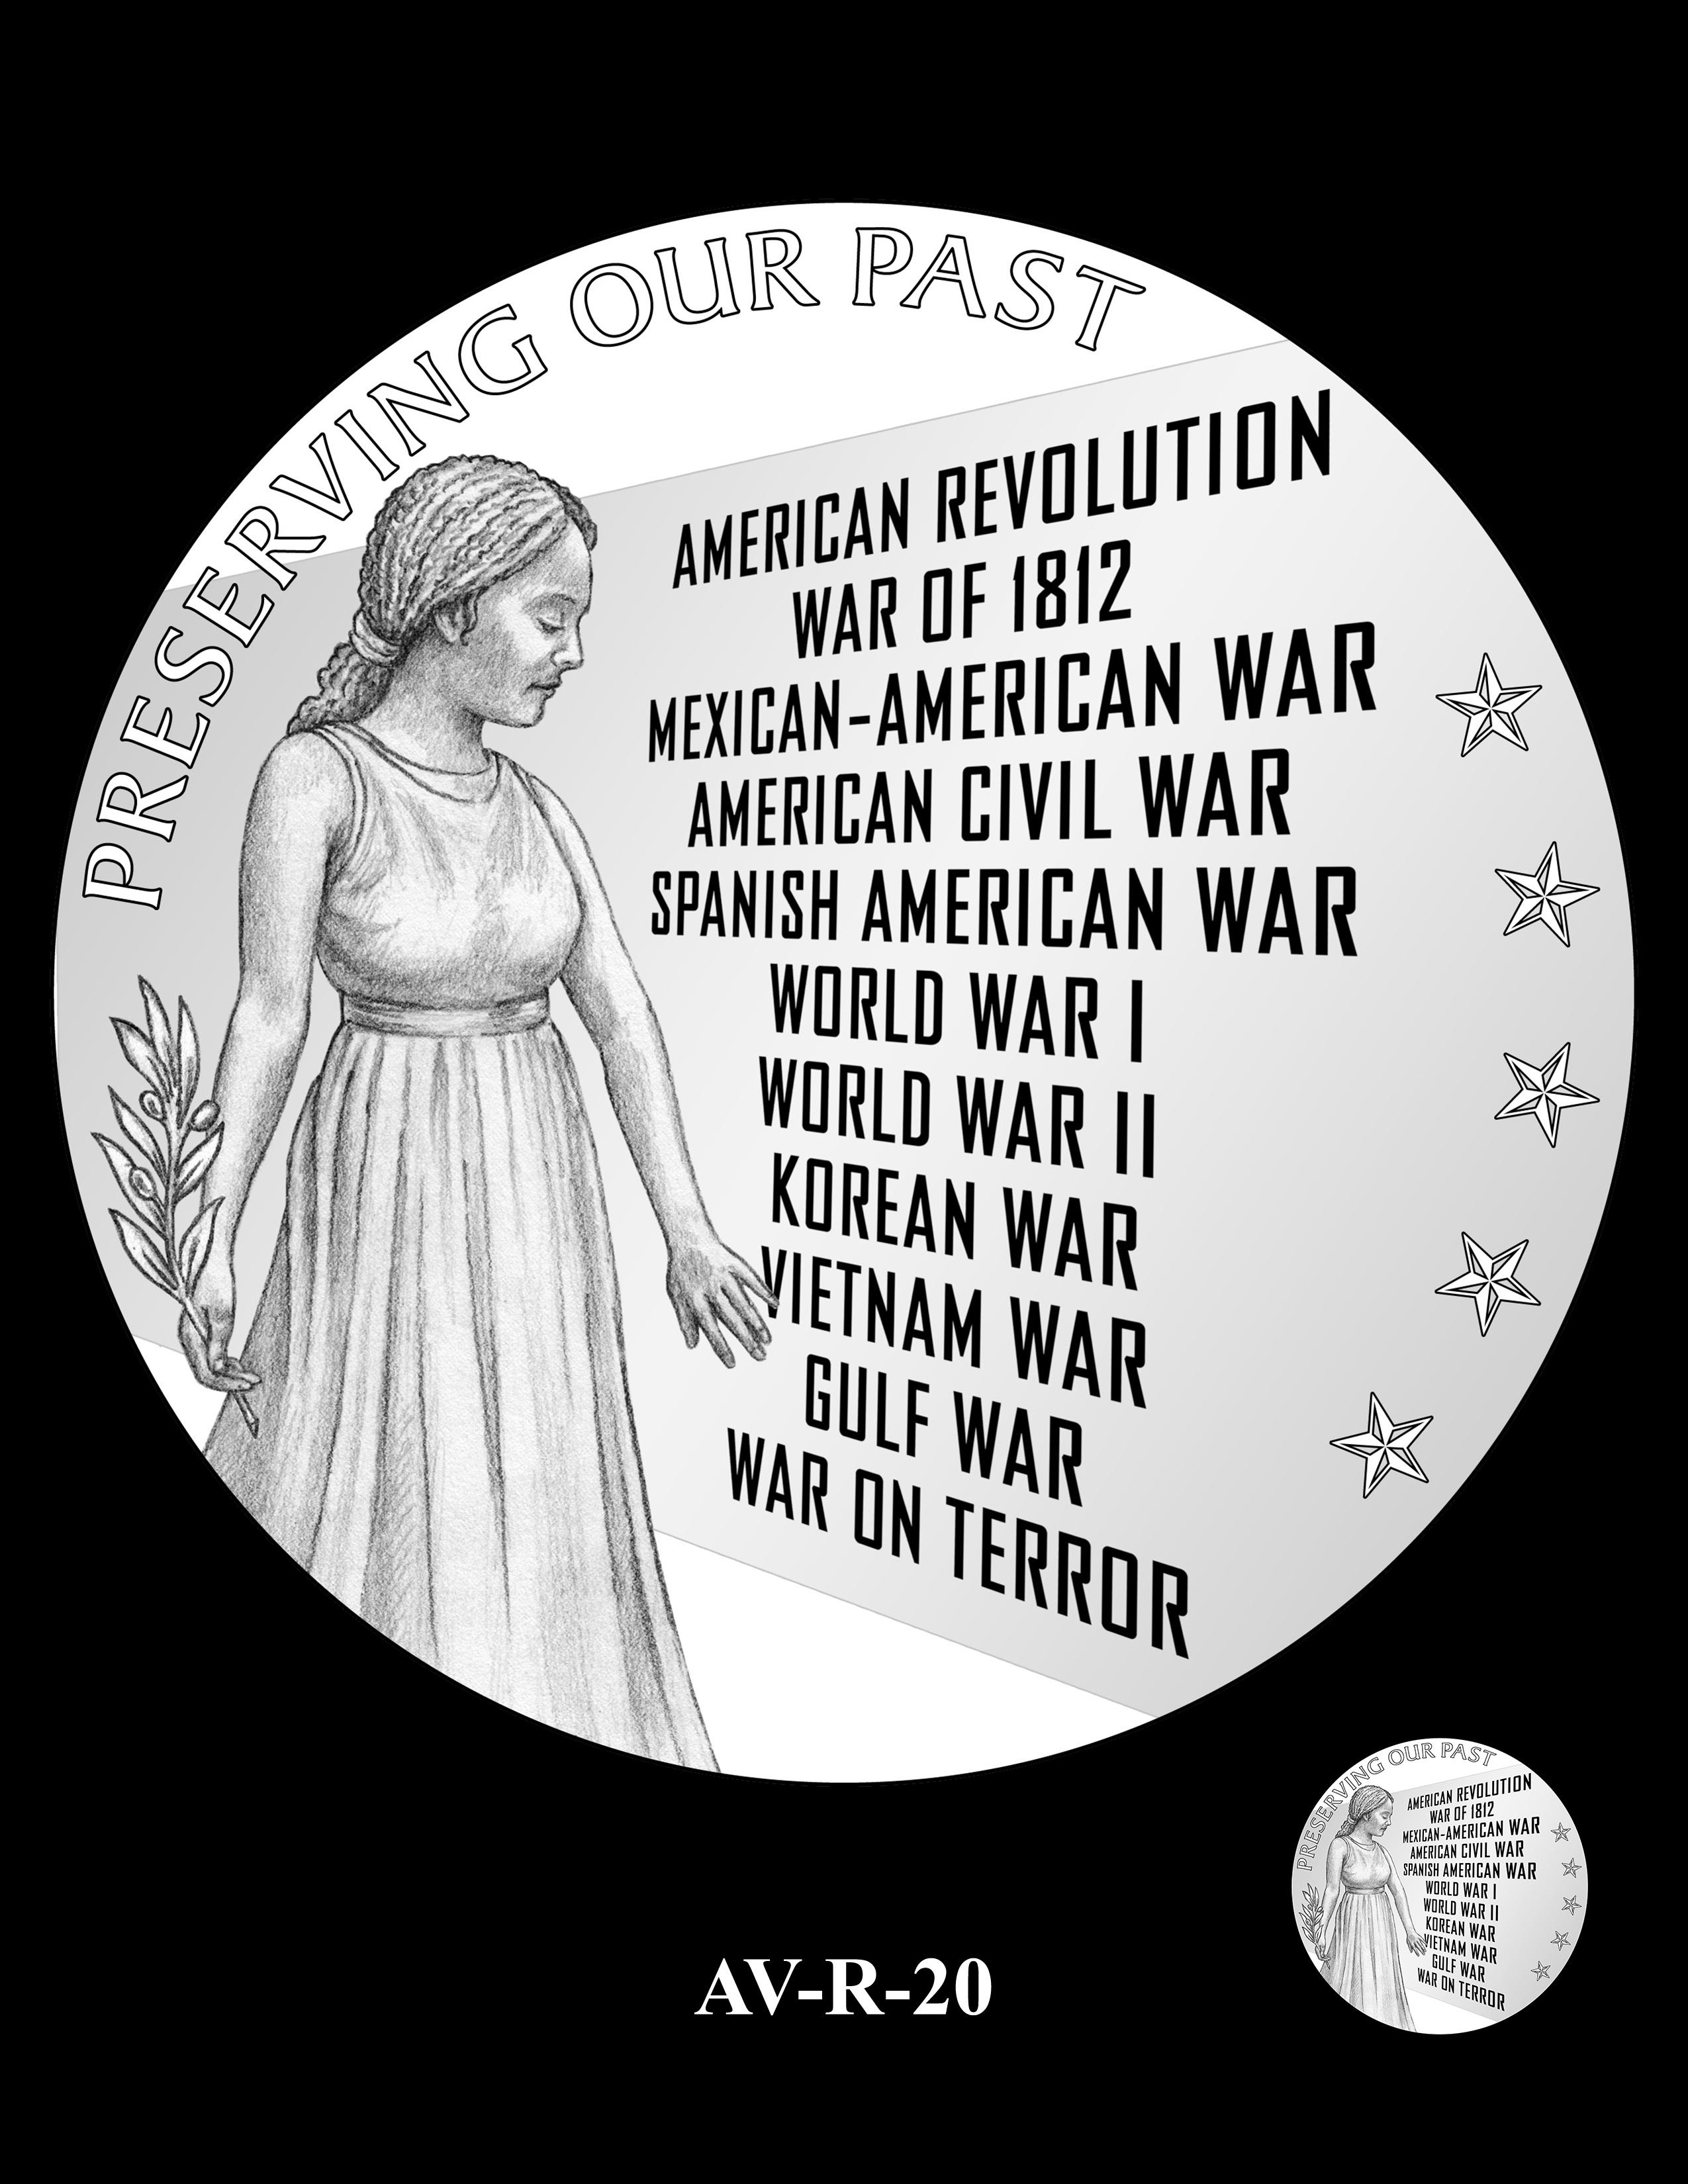 AV-R-20 - American Veterans Medal